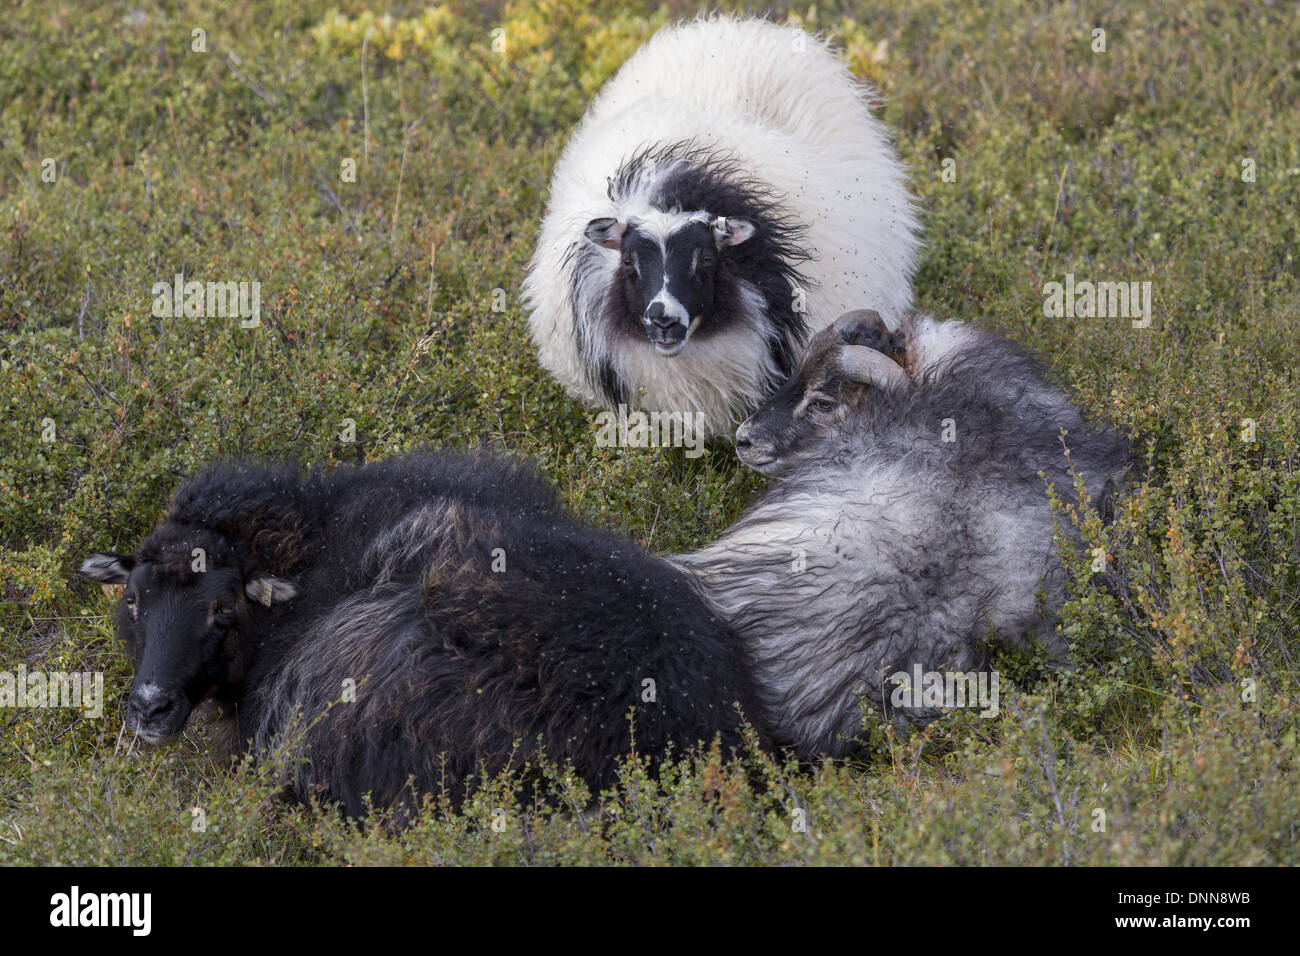 Three Icelandic sheep displaying various coloured fleeces - Stock Image